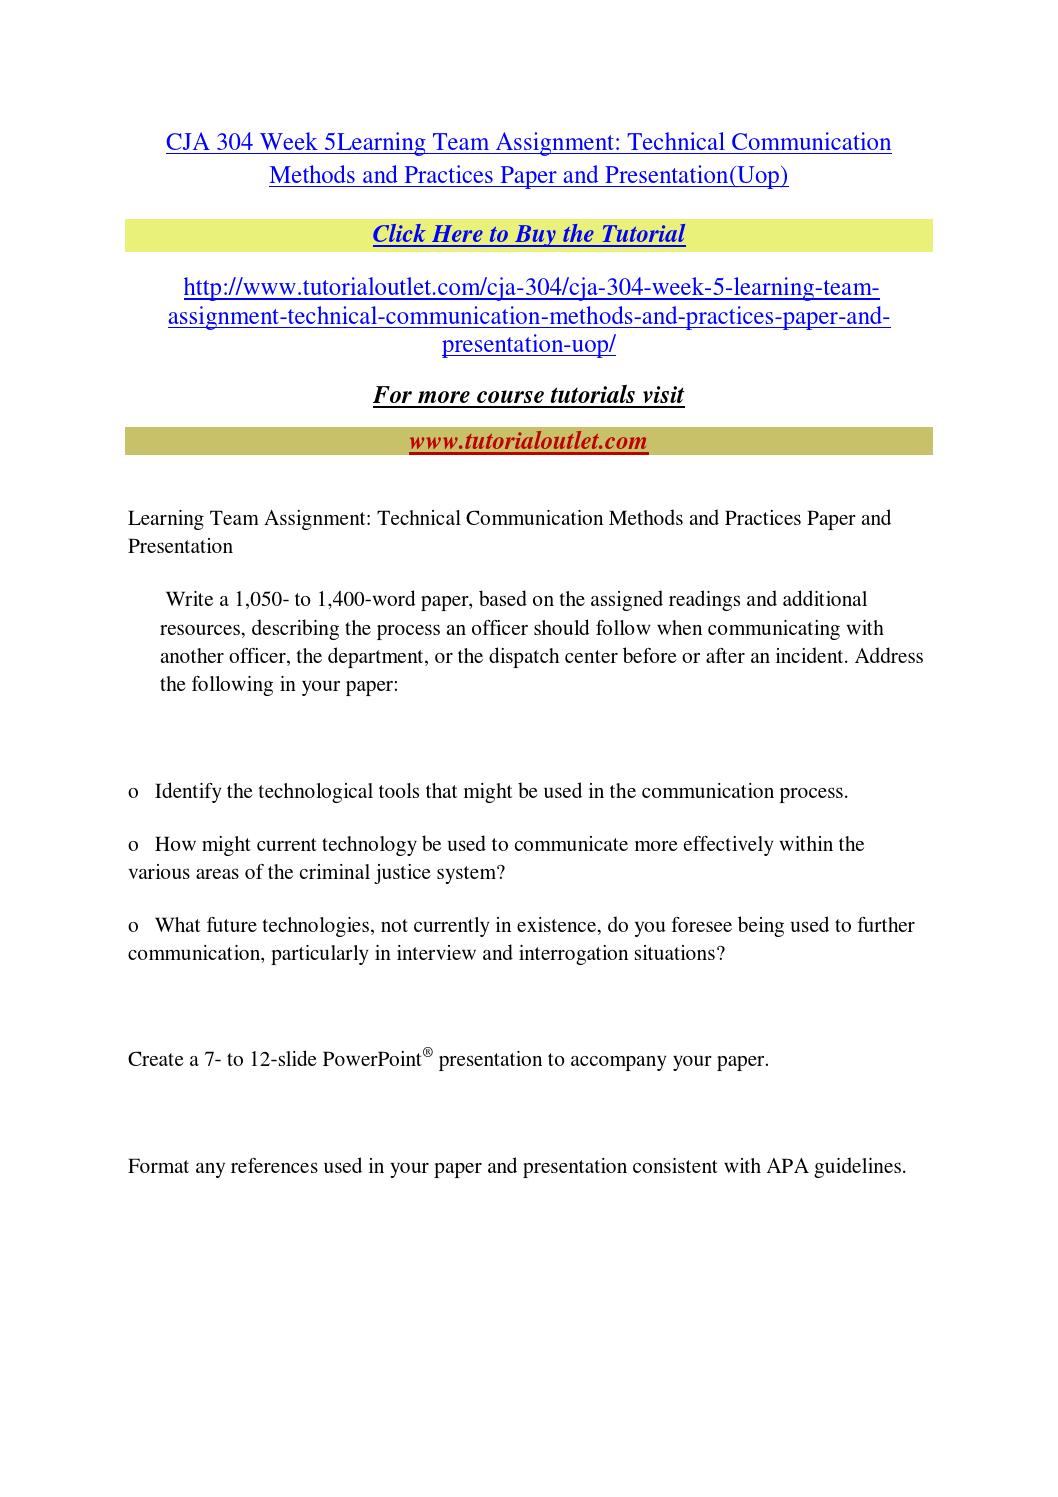 Cja 304 outlet peer educator/cja304outlet. Com for more classes.